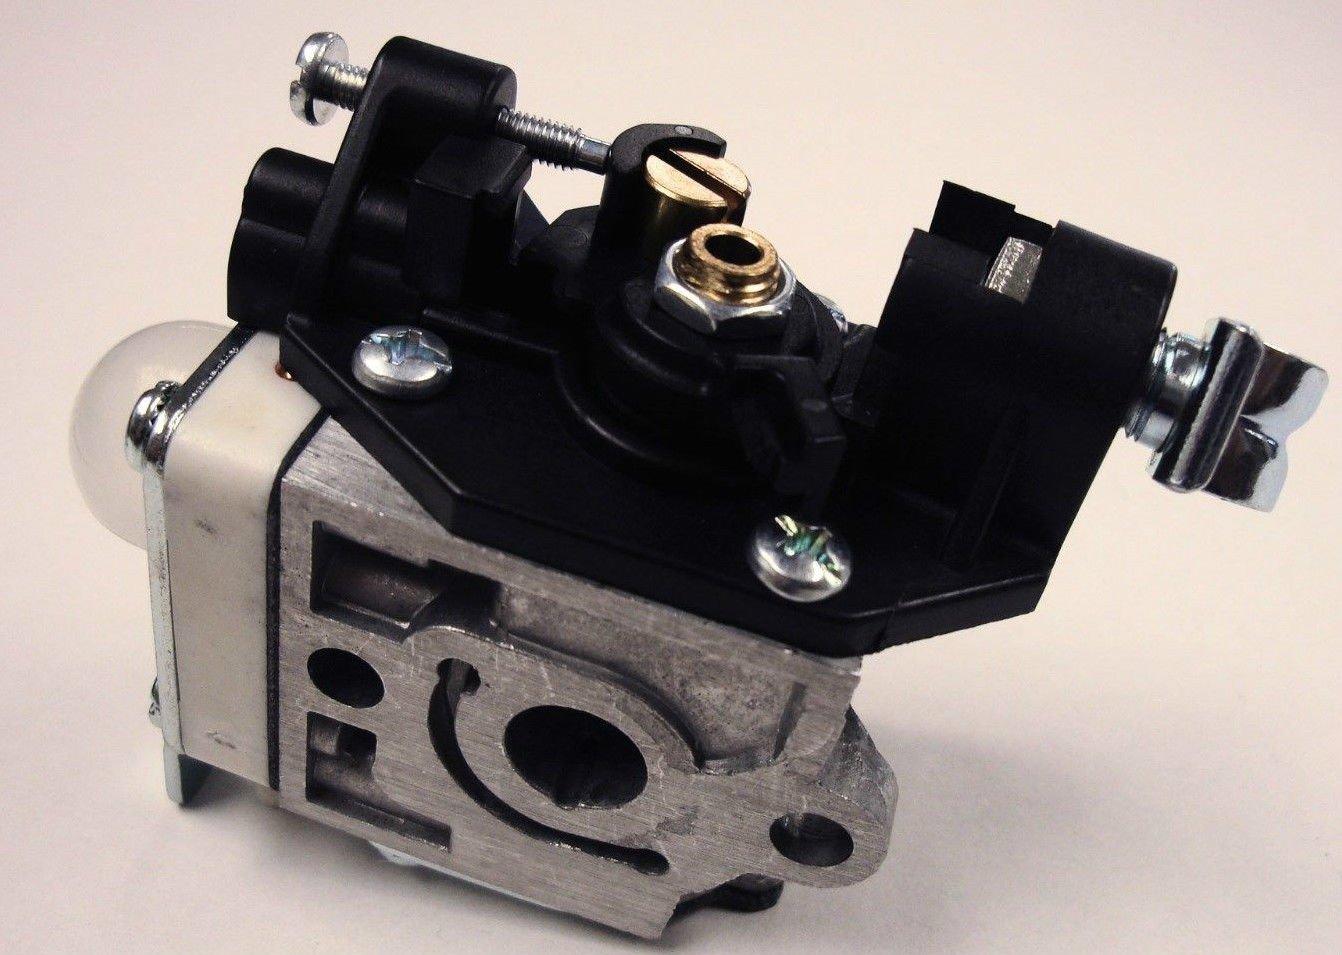 Echo A021003661 Genuine Carburetor RB-K106 for PB-250 ES-250 PB-250LN A021003660 + FREE EBOOK - YOUR LAWN & LAWN CARE -